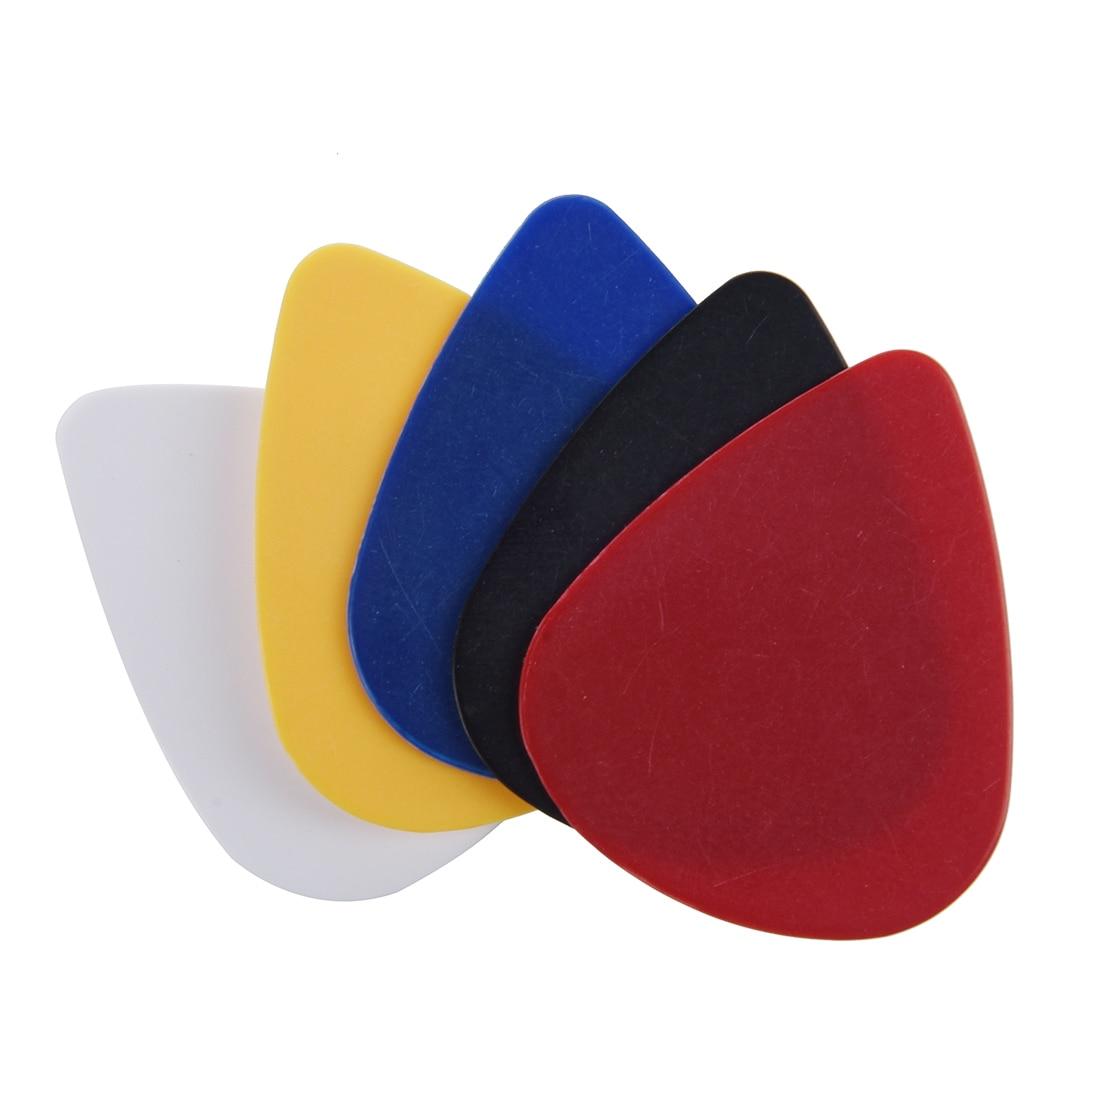 100pcs 0.58 - 0.86 mm Assorted Color Plectrums Plastic Guitar Picks